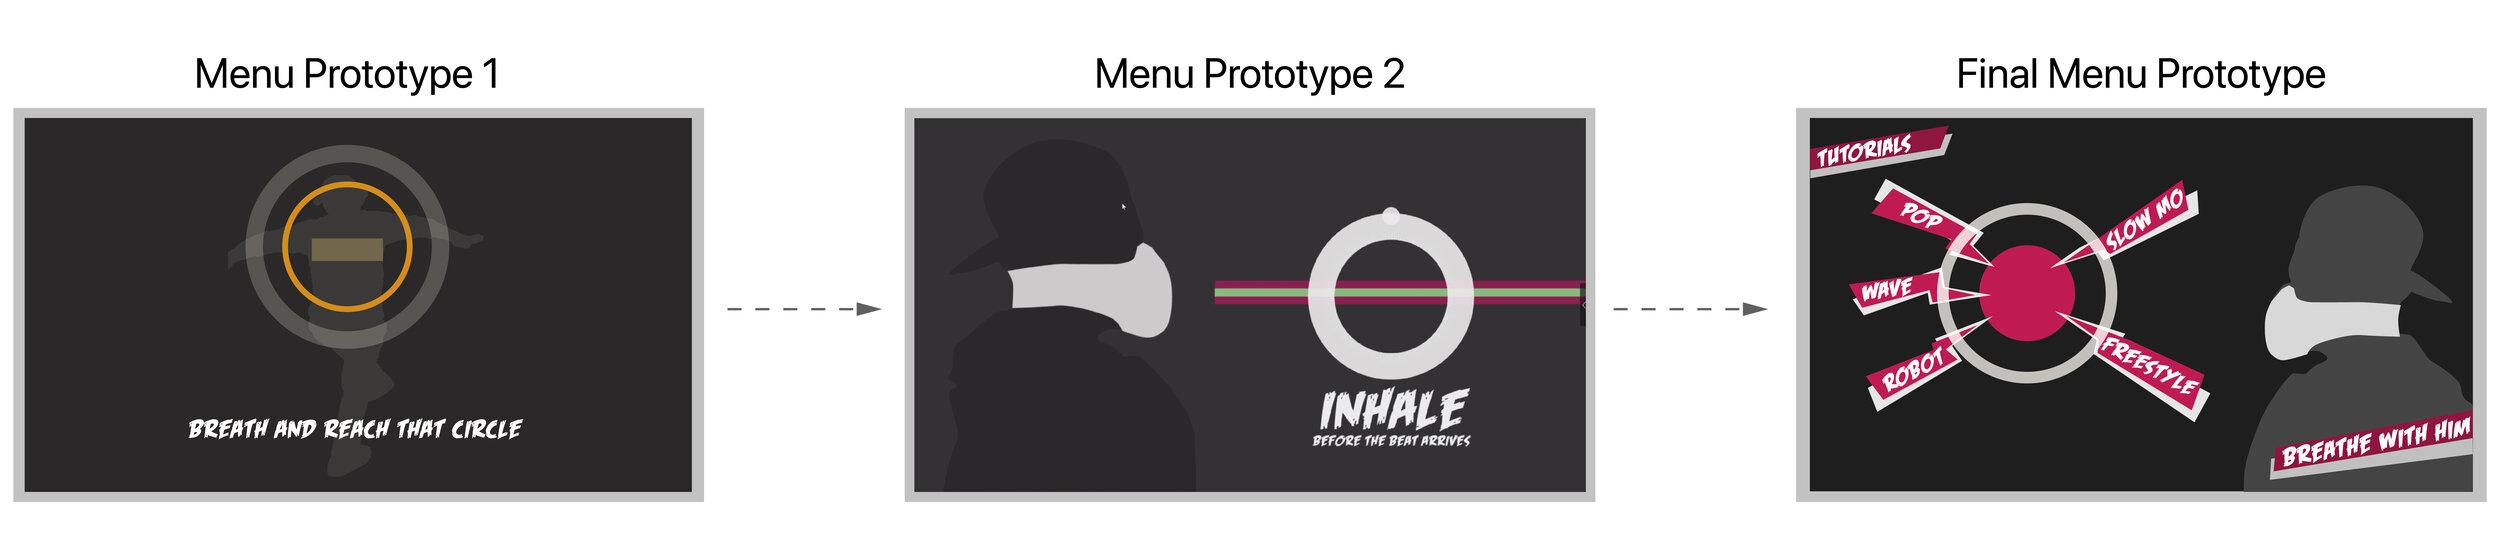 process-03.jpg